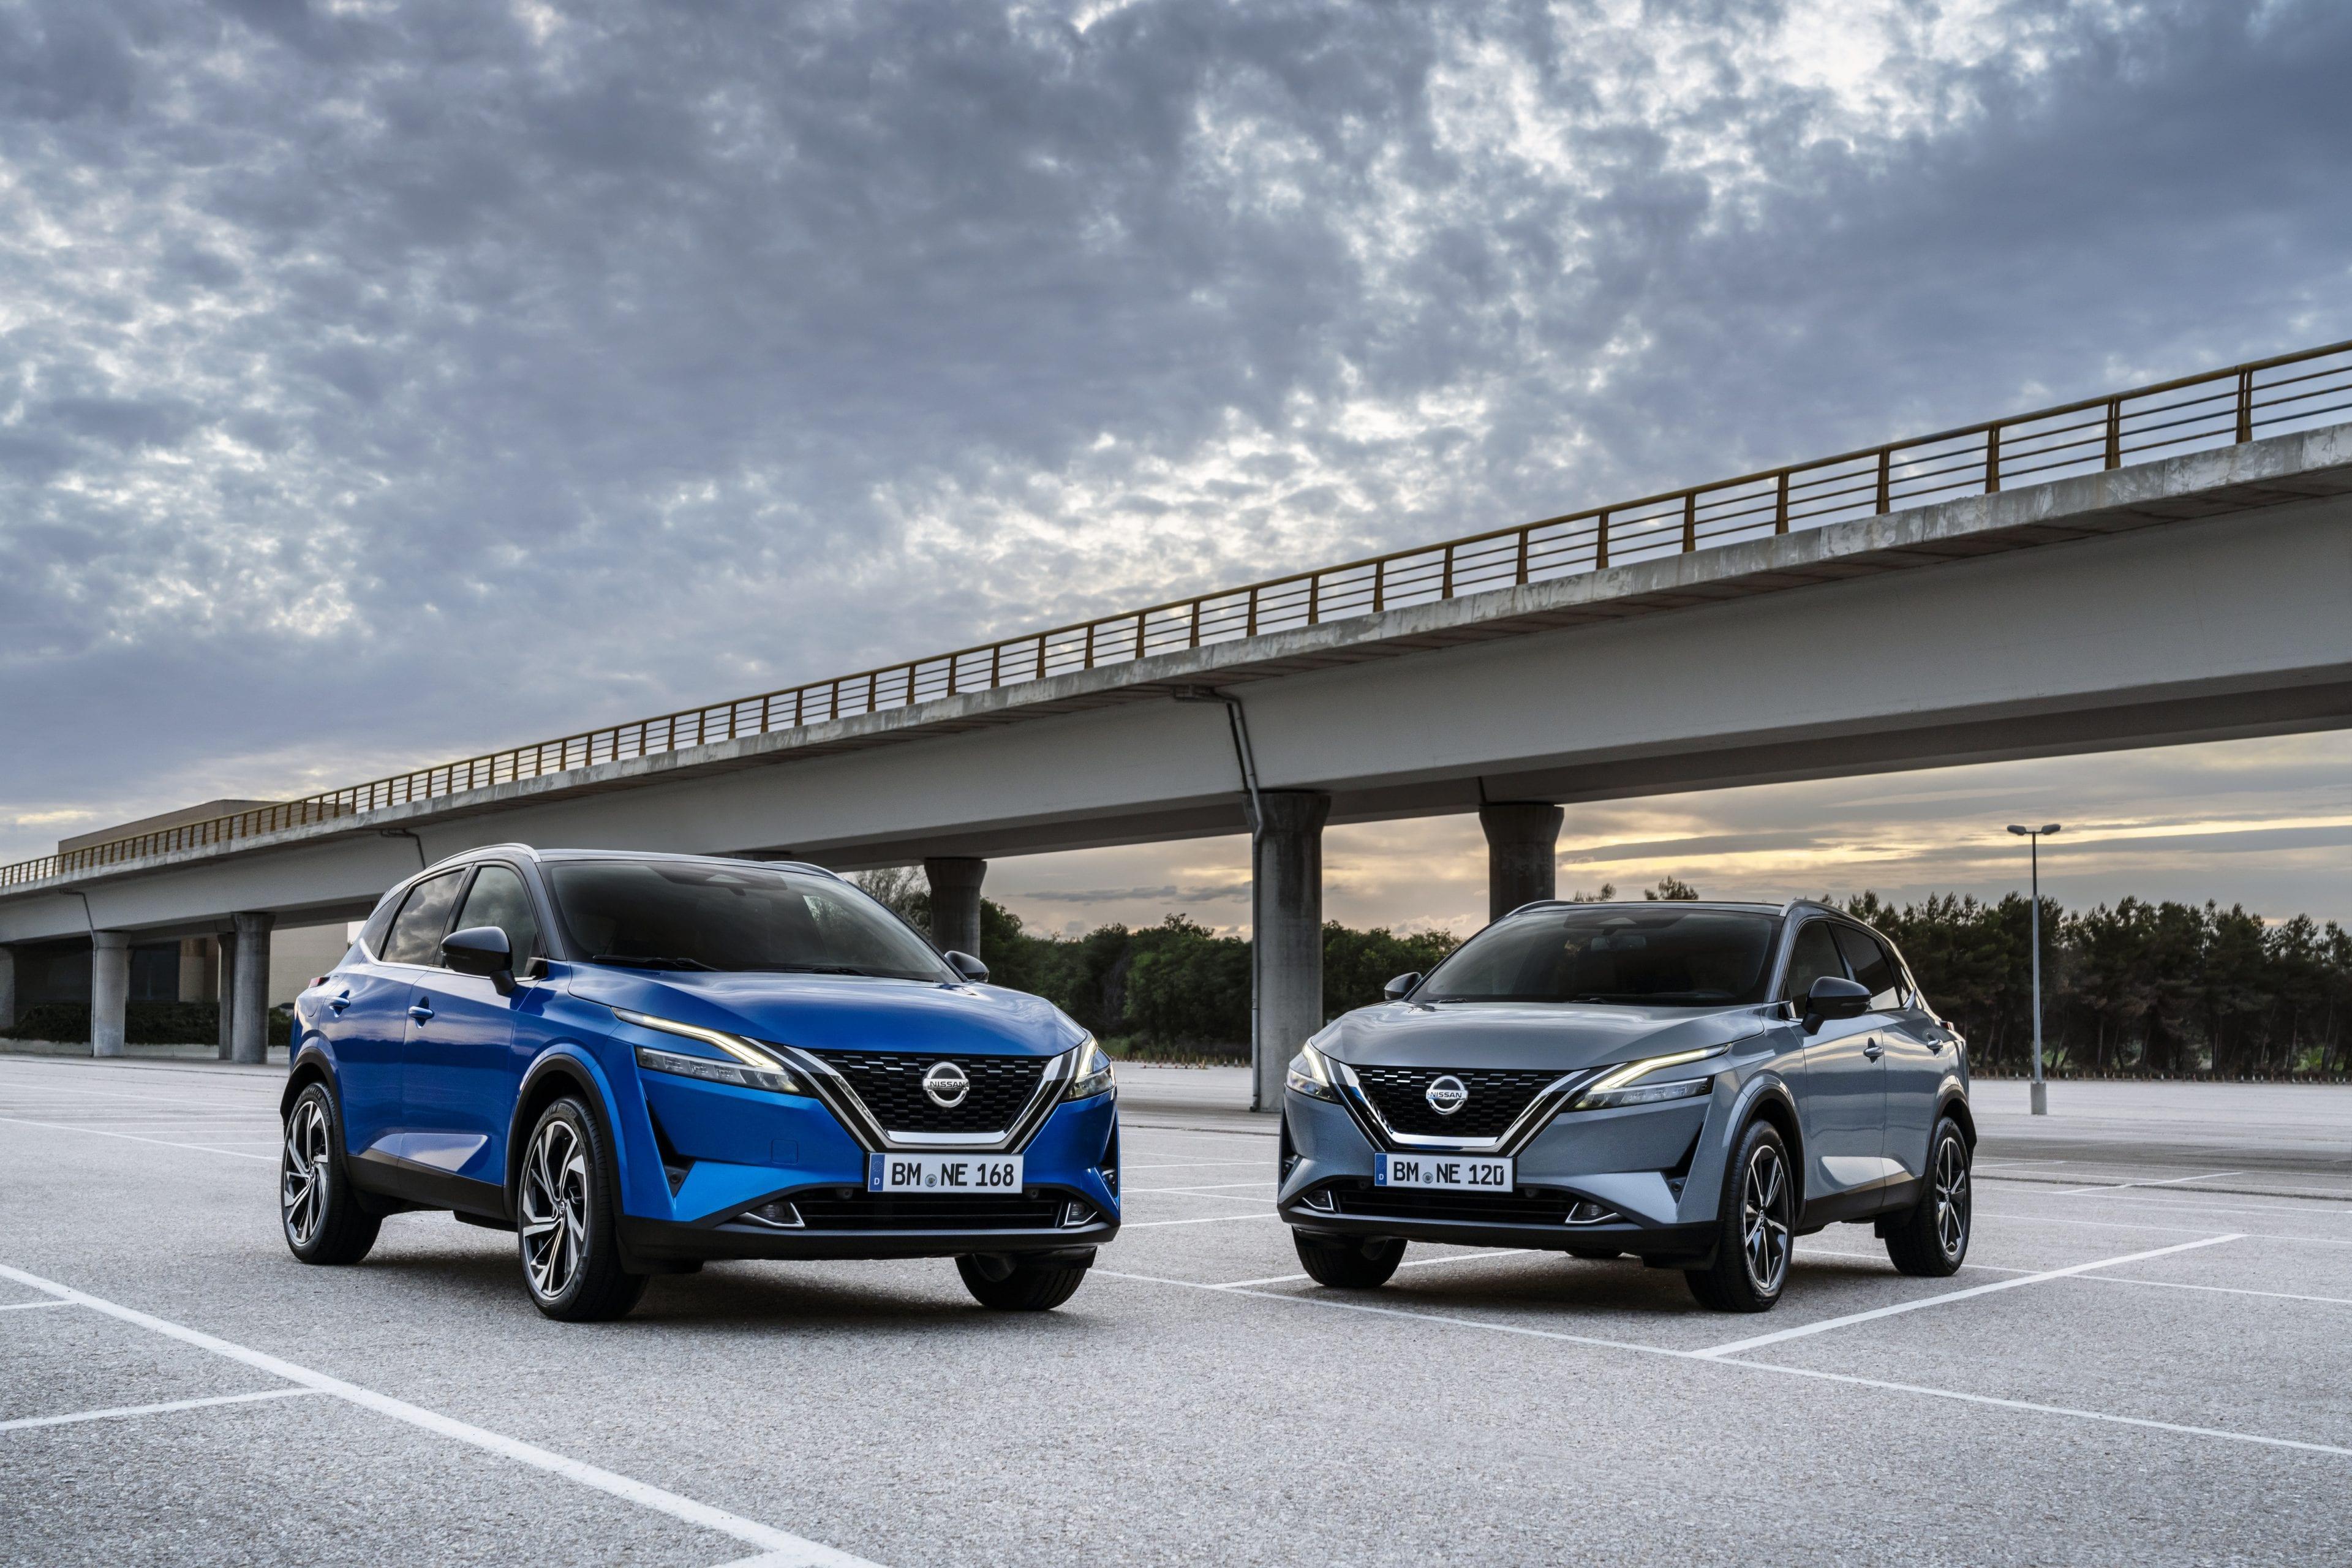 De nieuwe Nissan Qashqai